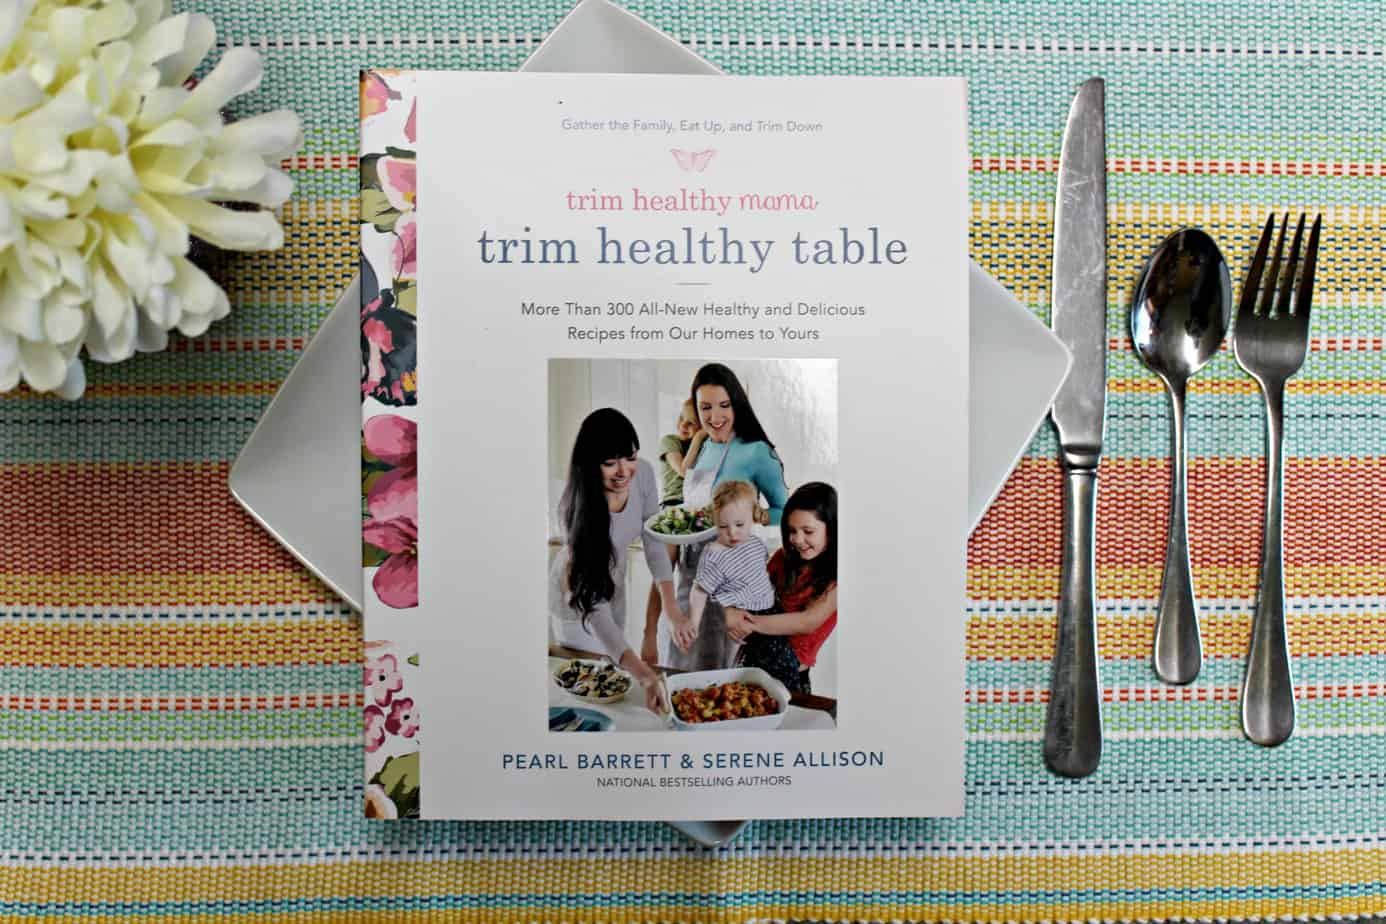 Trim Healthy Mama's Trim Healthy Table Cookbook #TrimHealthyTable